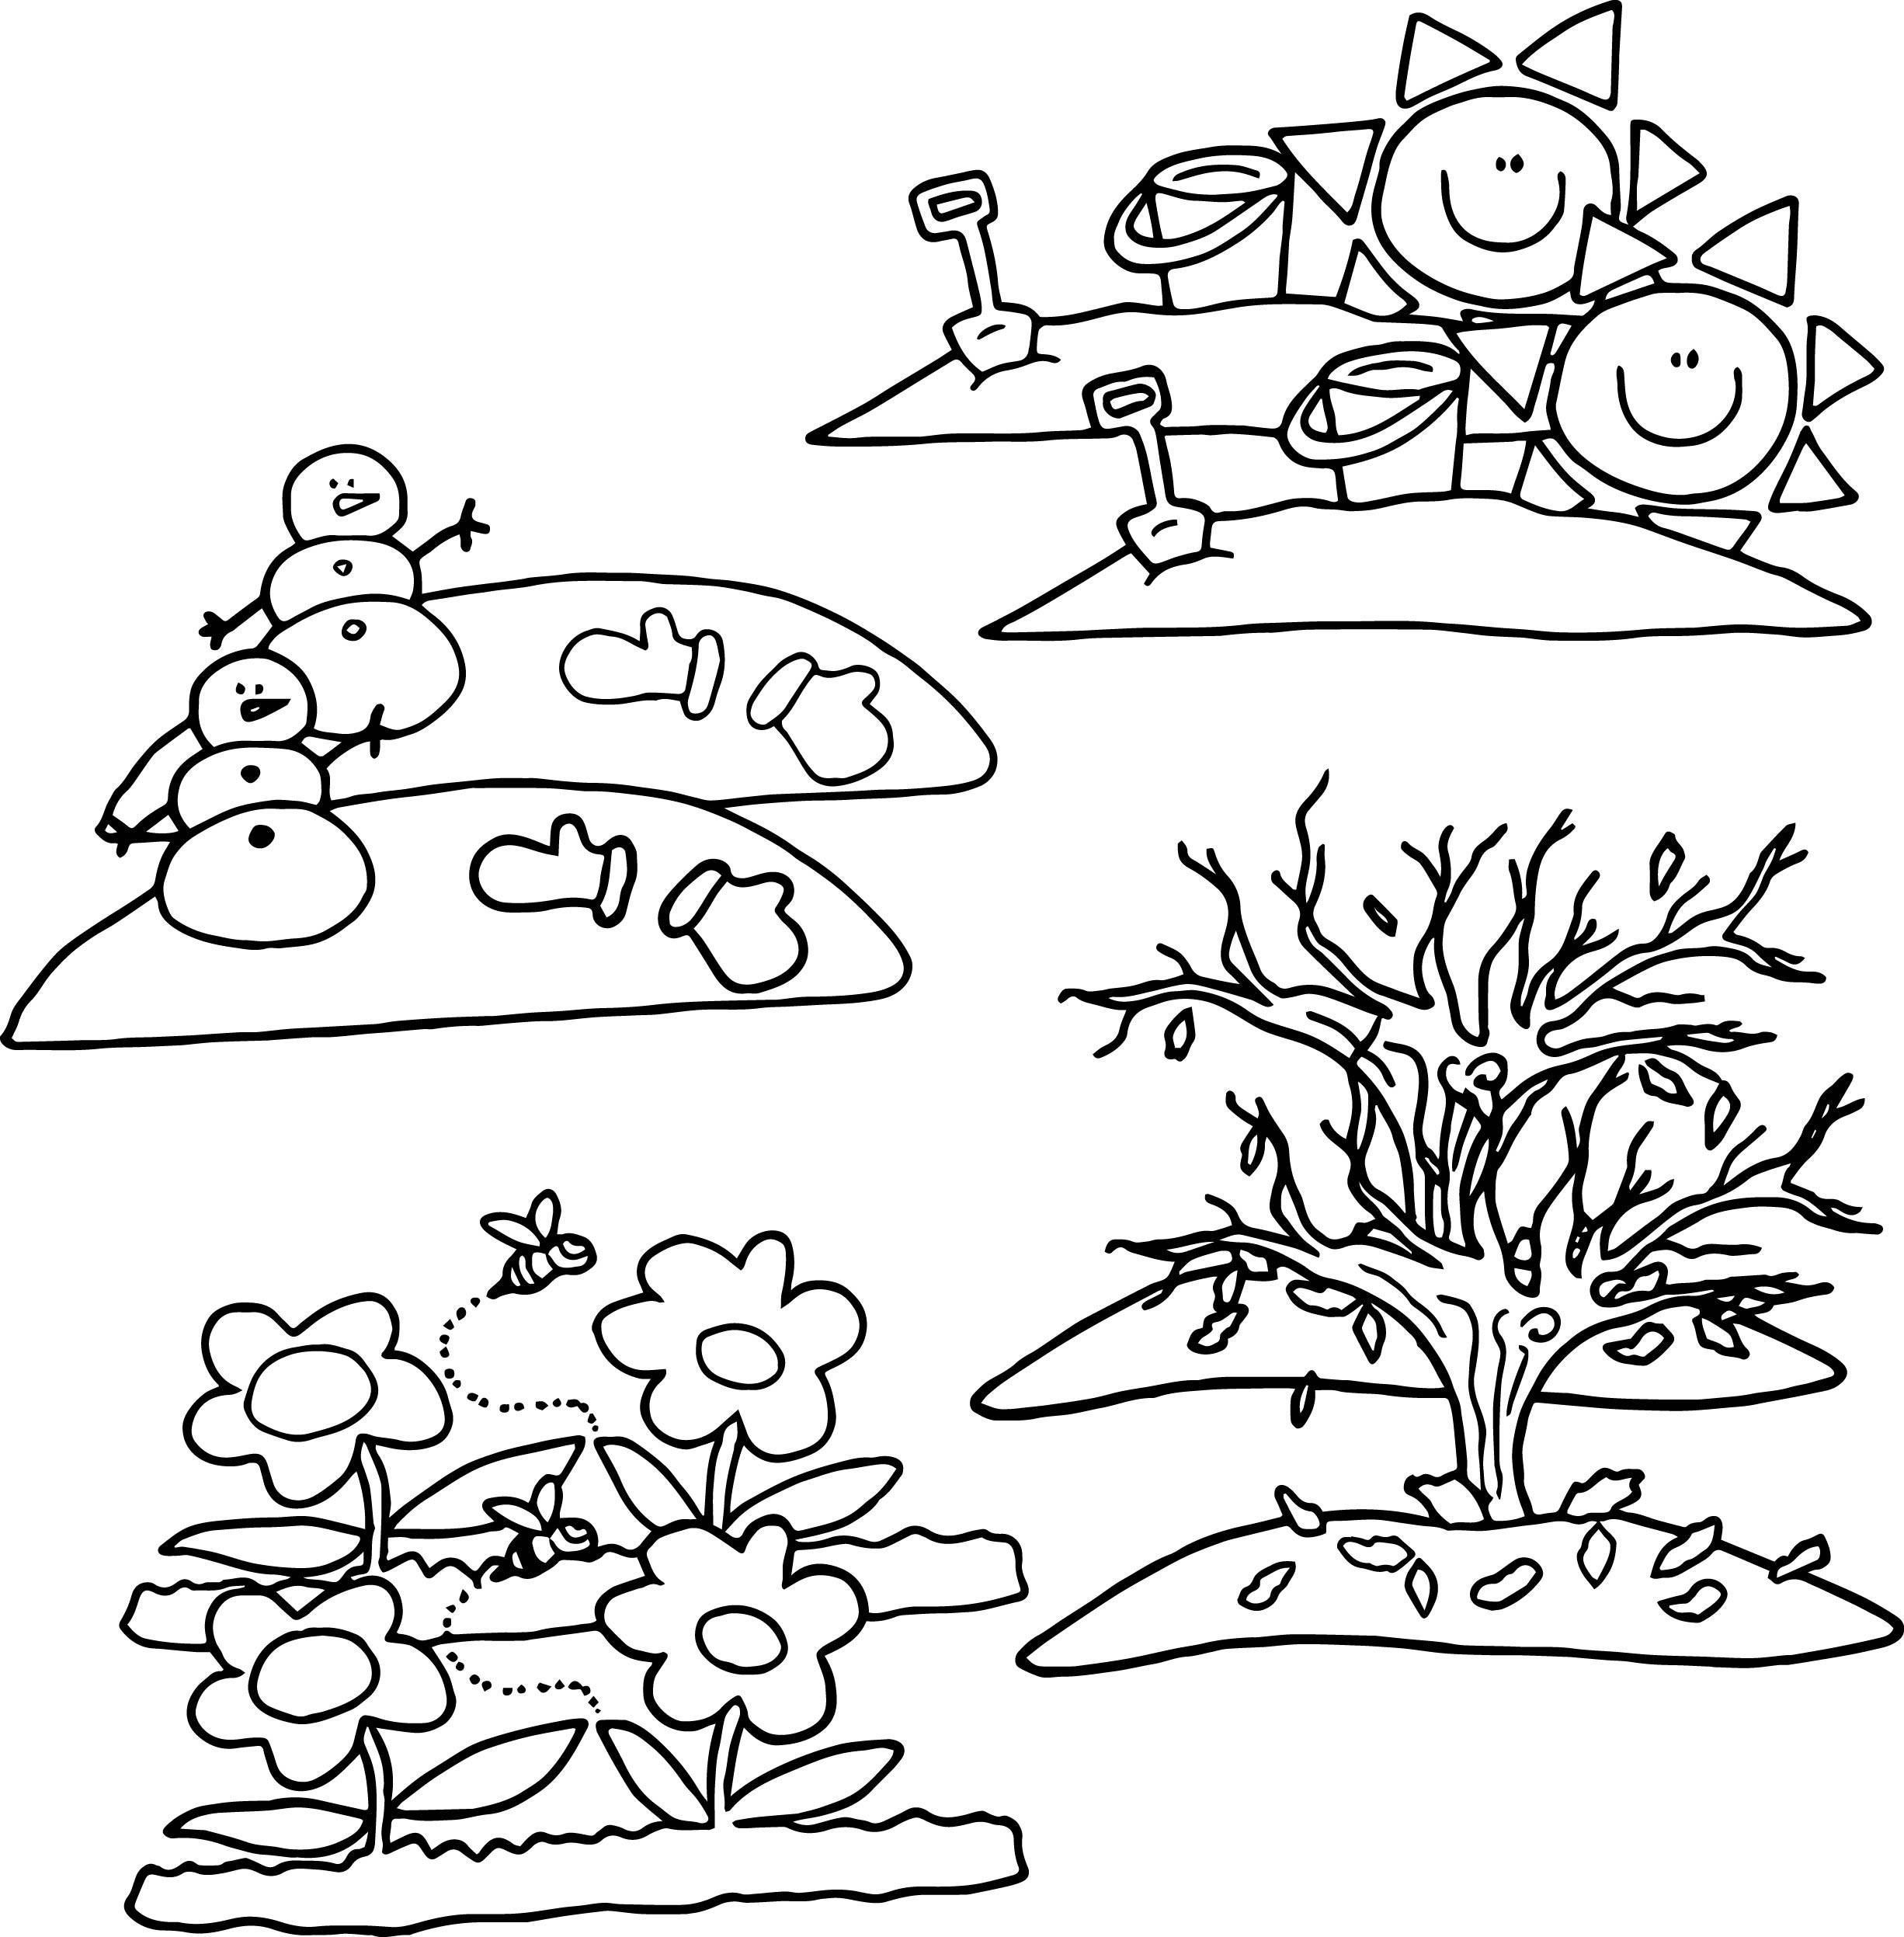 Seasons Coloring Pages  4 Seasons Cartoon Coloring Page